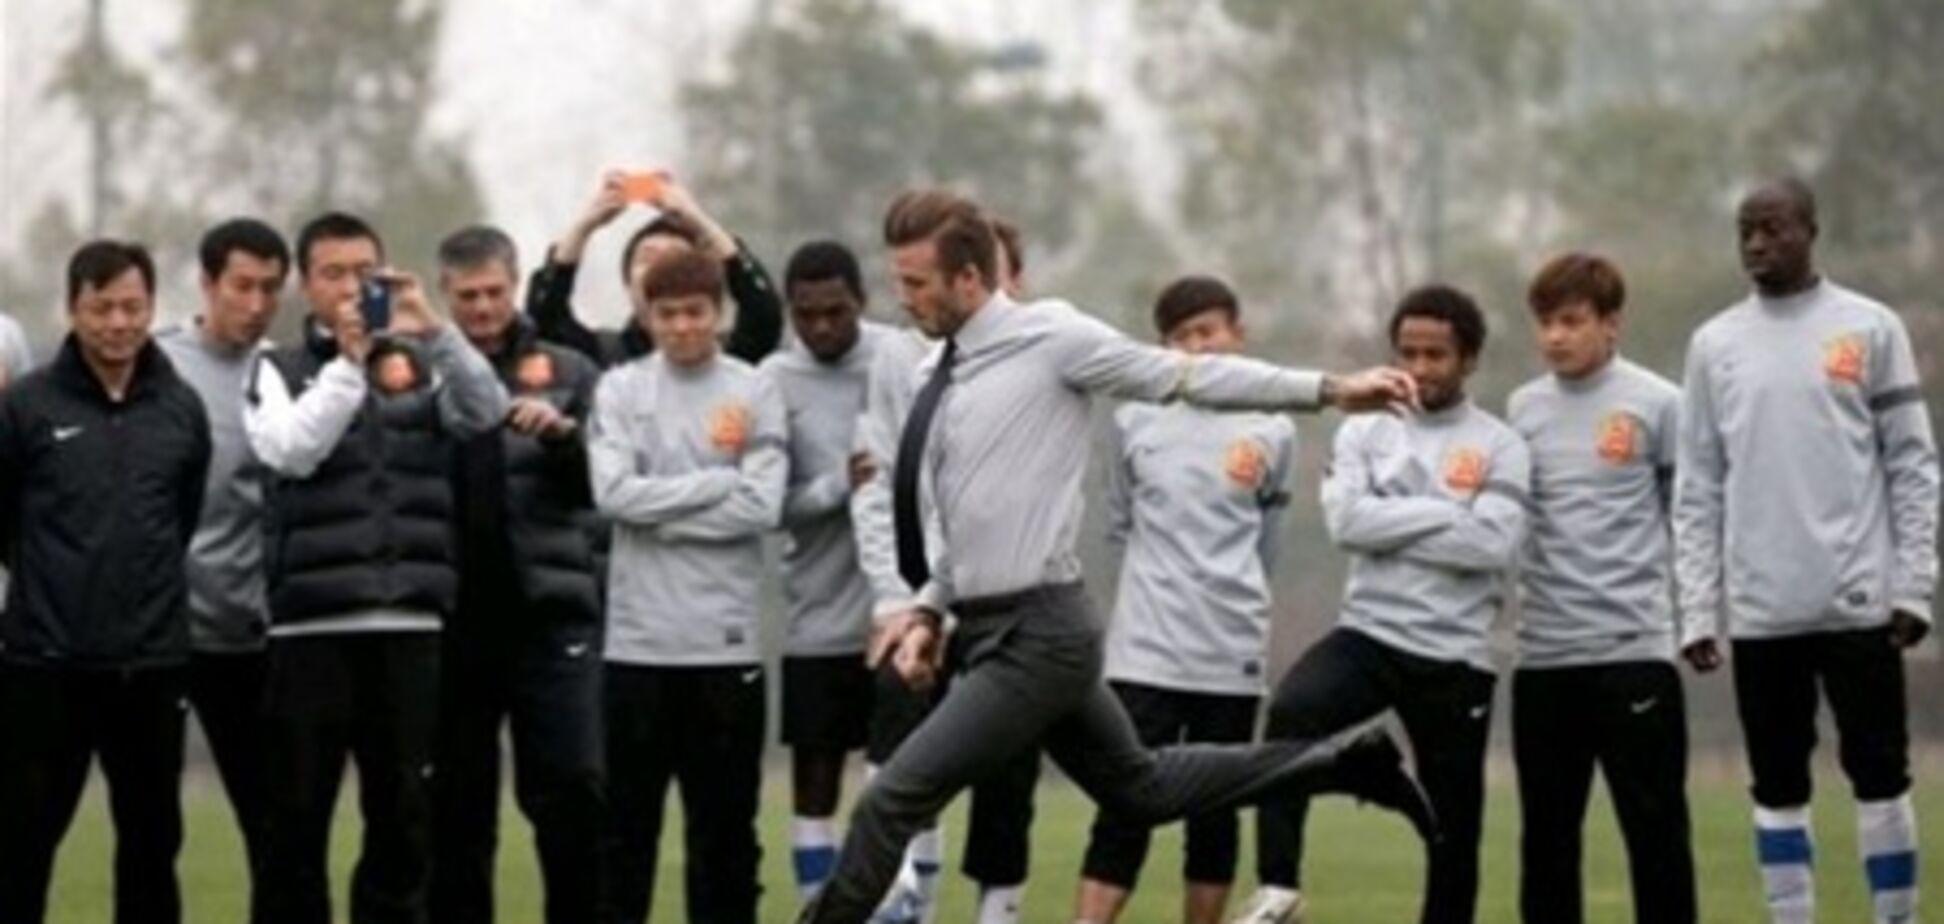 Бэкхем ярко оконфузился перед китайскими футболистами. Фото